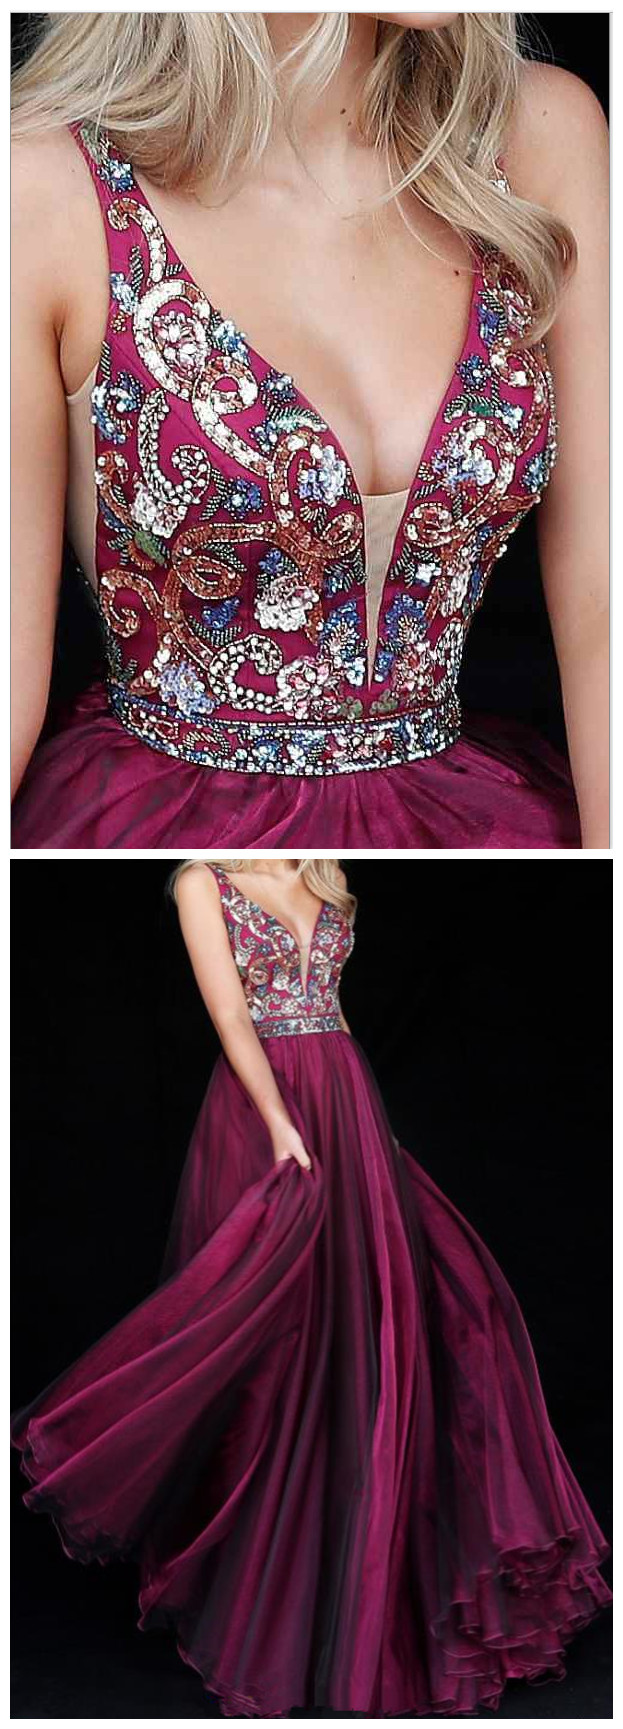 NEW_Sexy_backless_prom_dress,_Burgundy_prom_dress,_Beading_V_neckline_prom_dress,_prom_dress,_Sexy_prom_dress,_backless_prom_dress